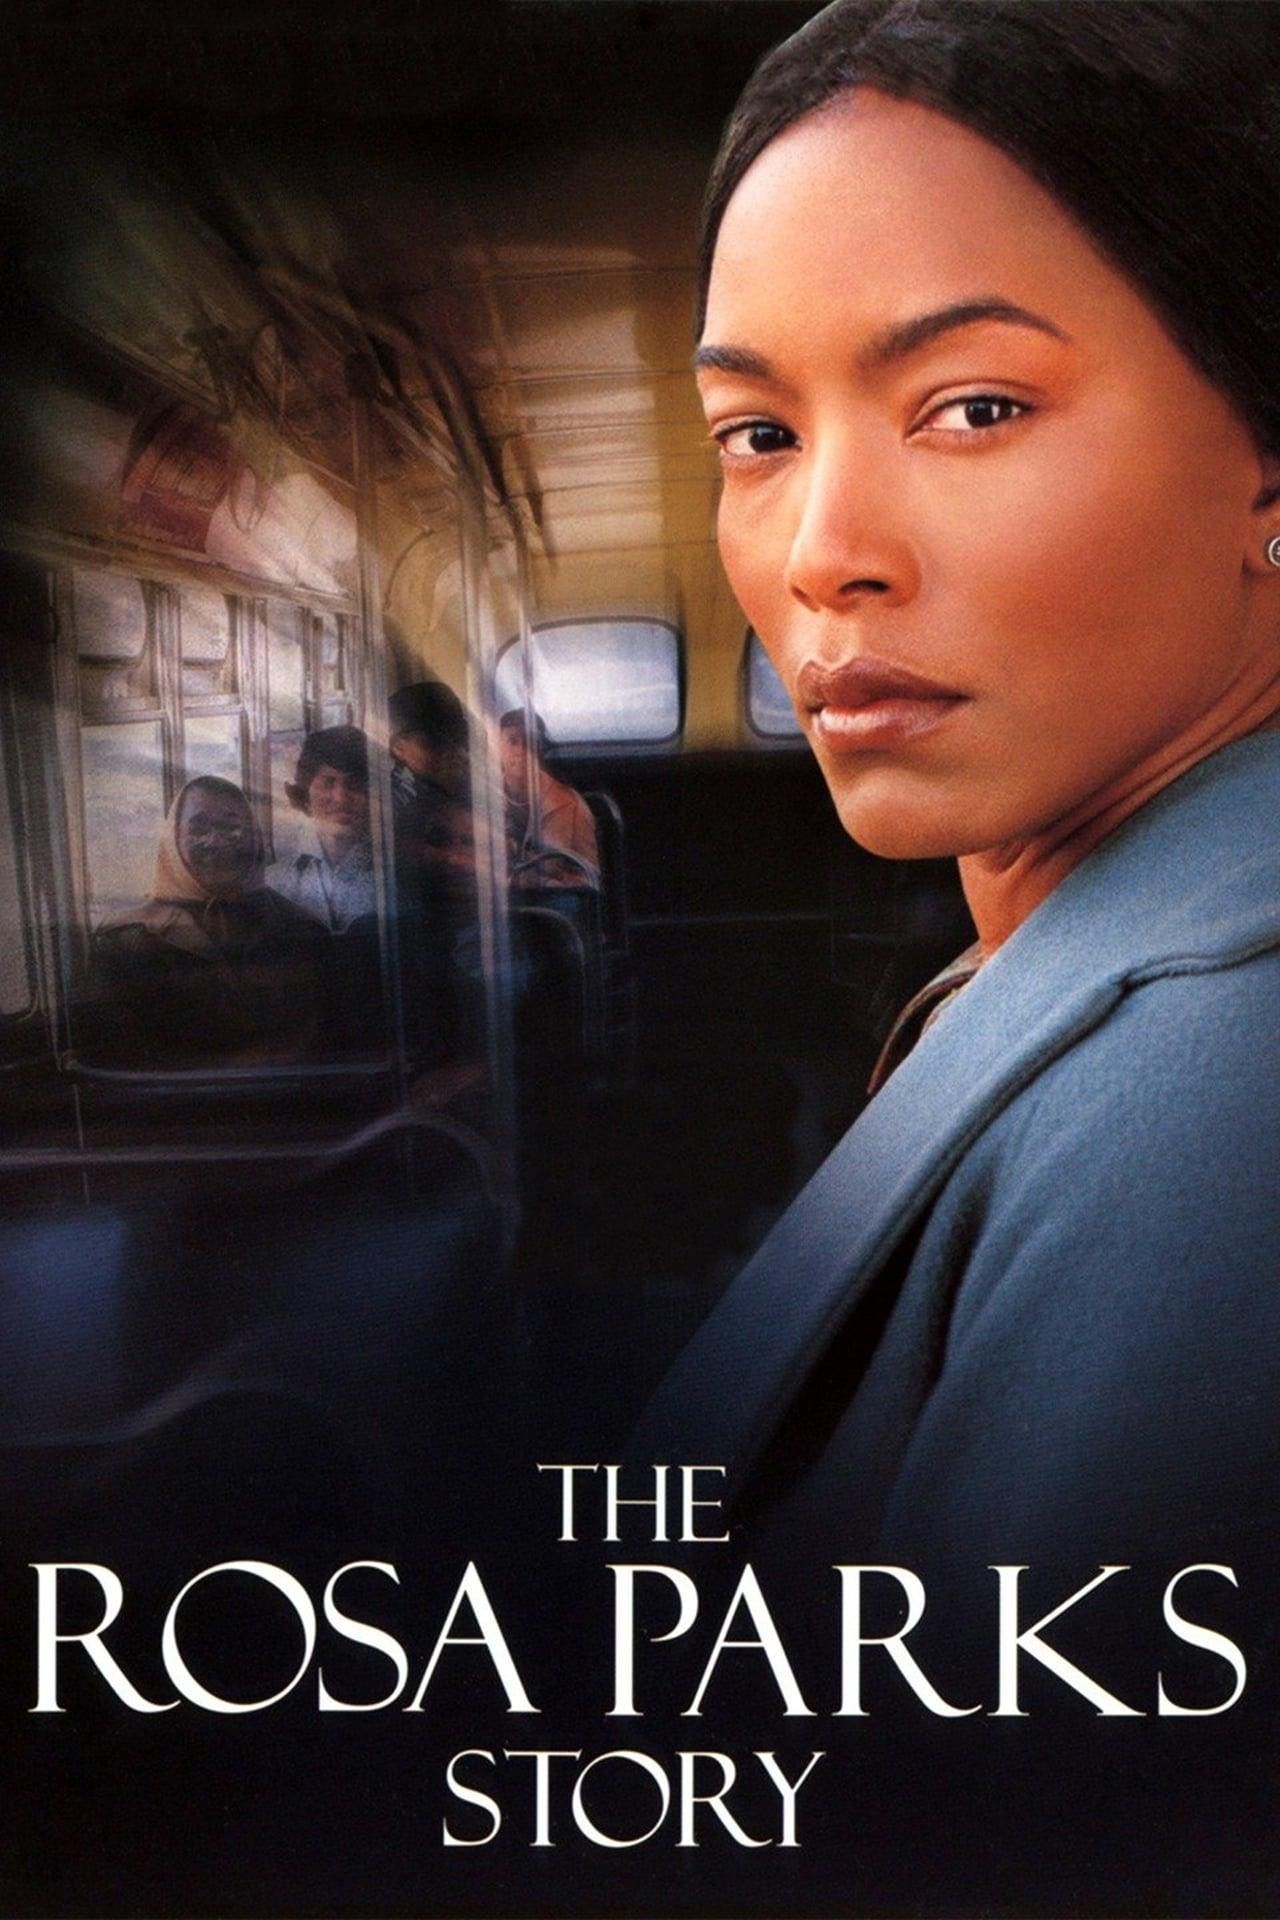 the rosa parks story full movie viooz